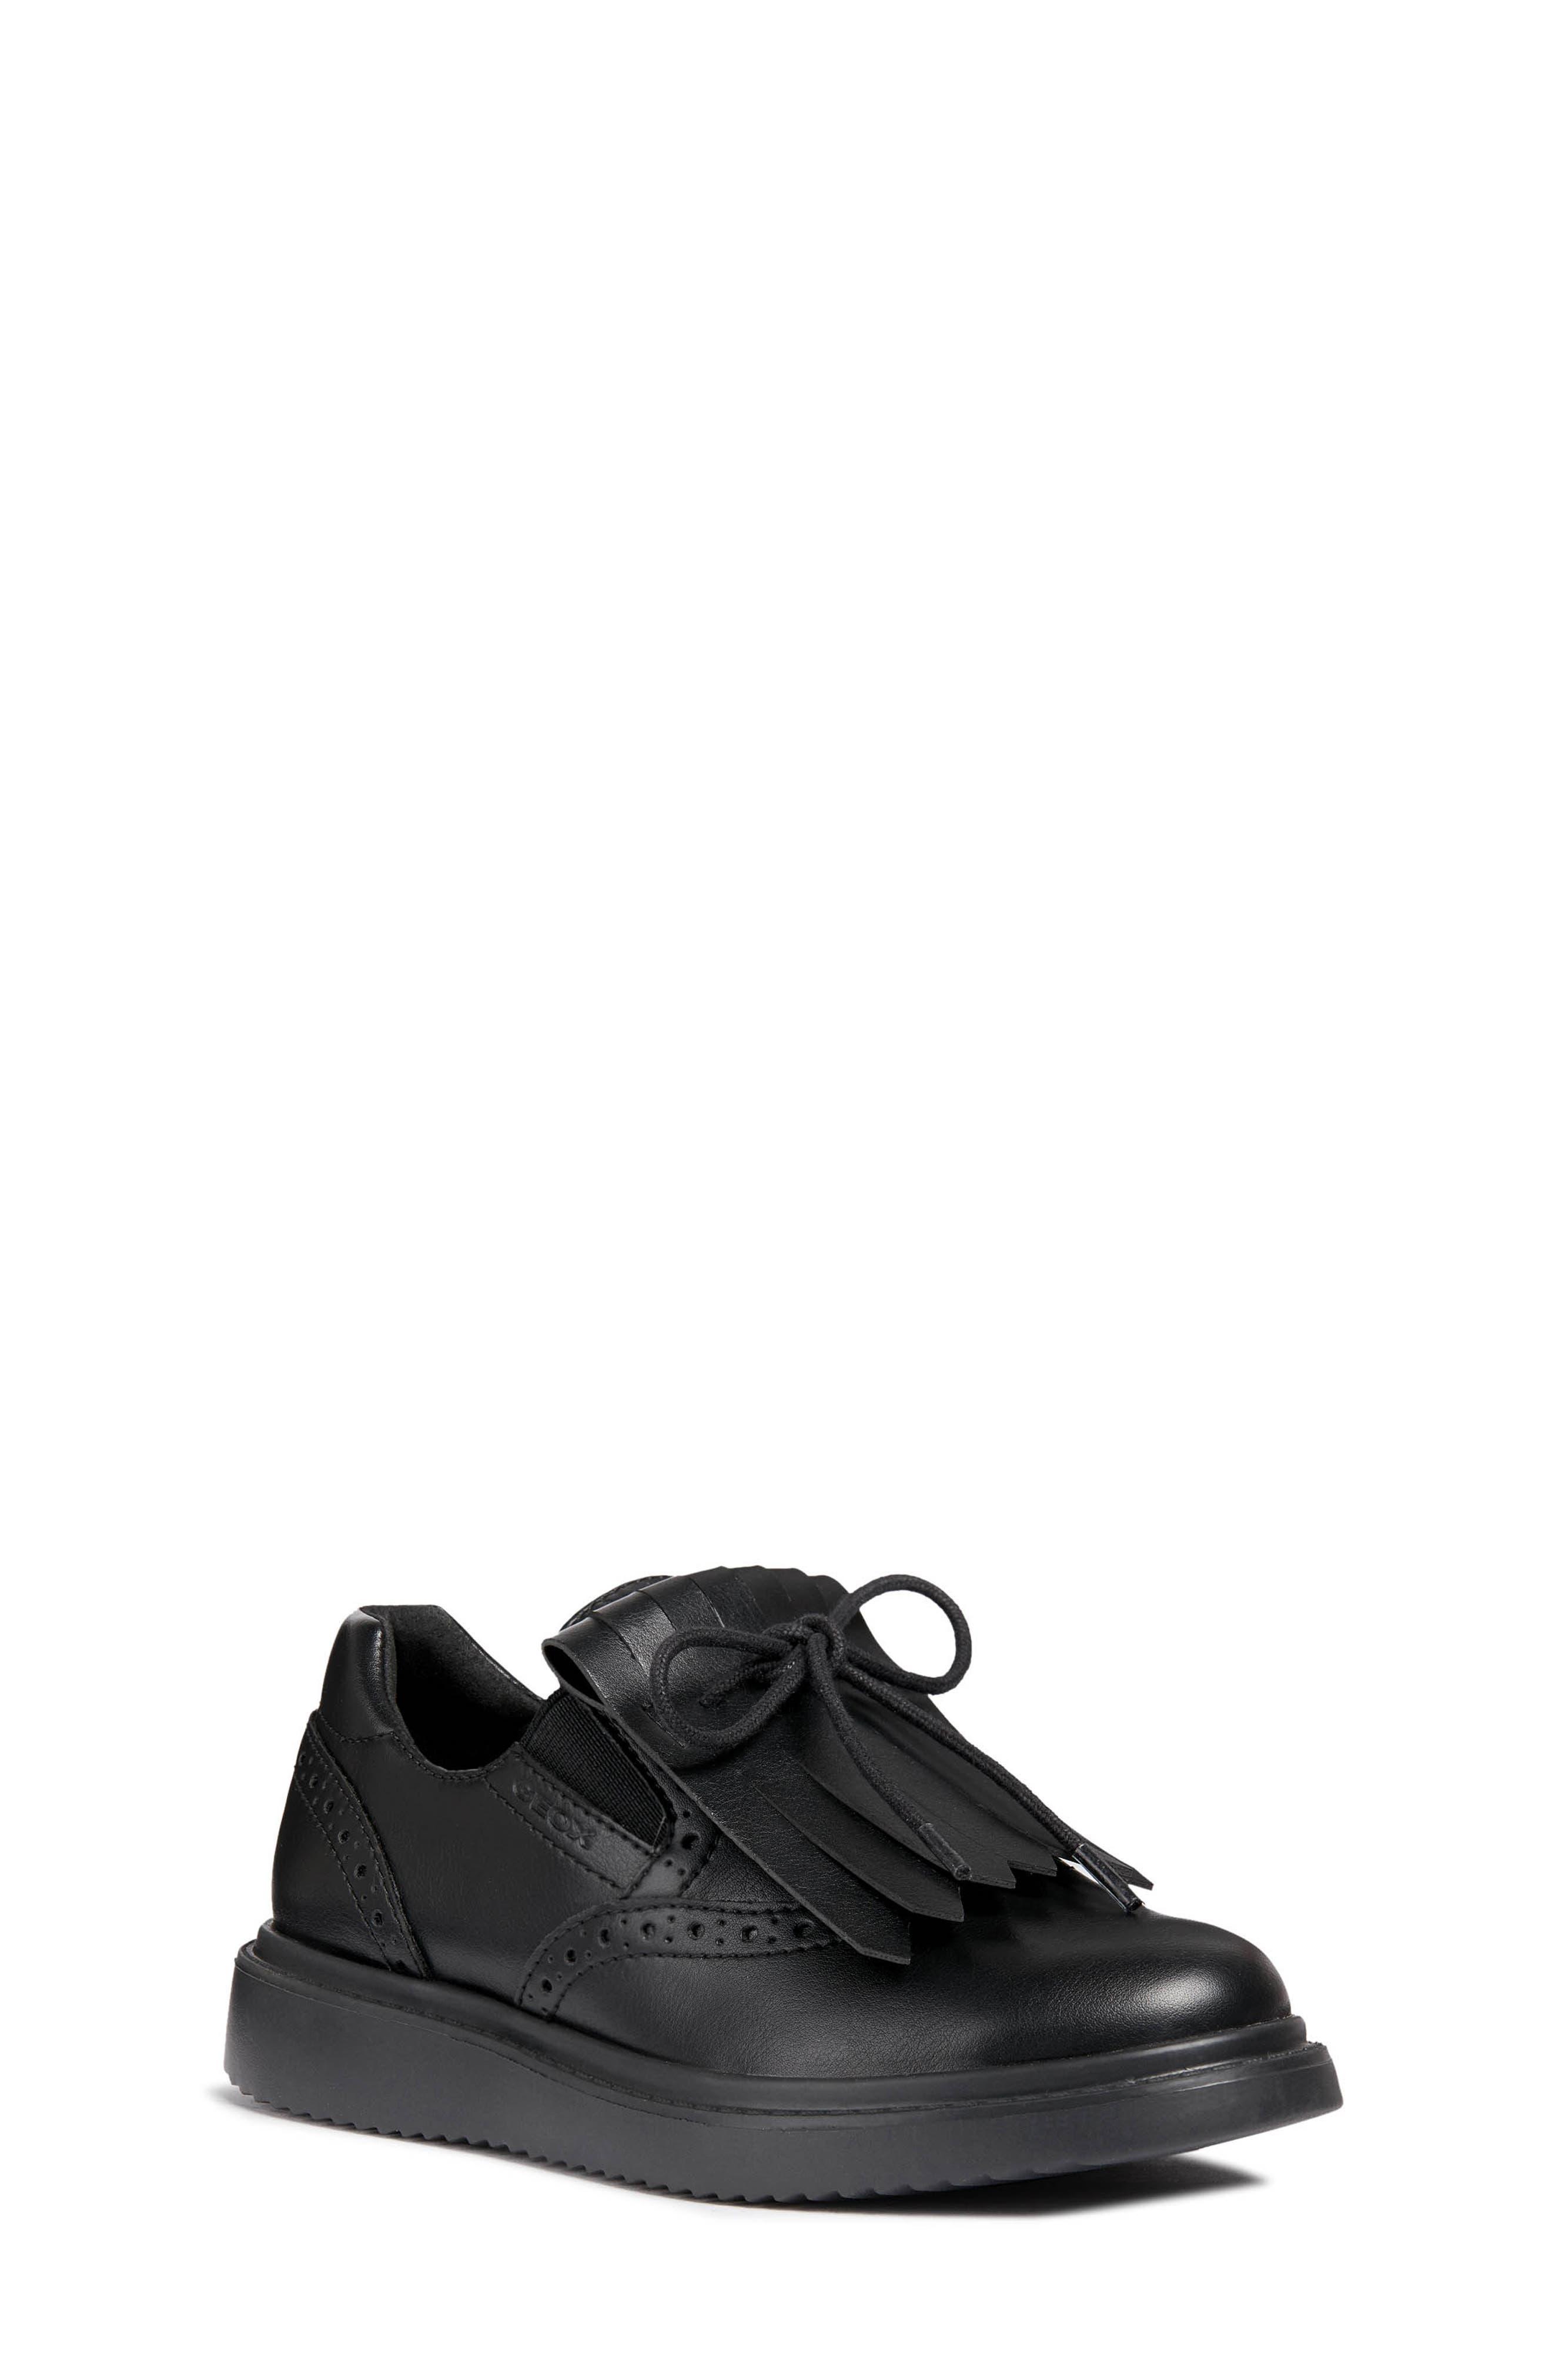 Thymar Kiltie Fringe Sneaker,                         Main,                         color, BLACK